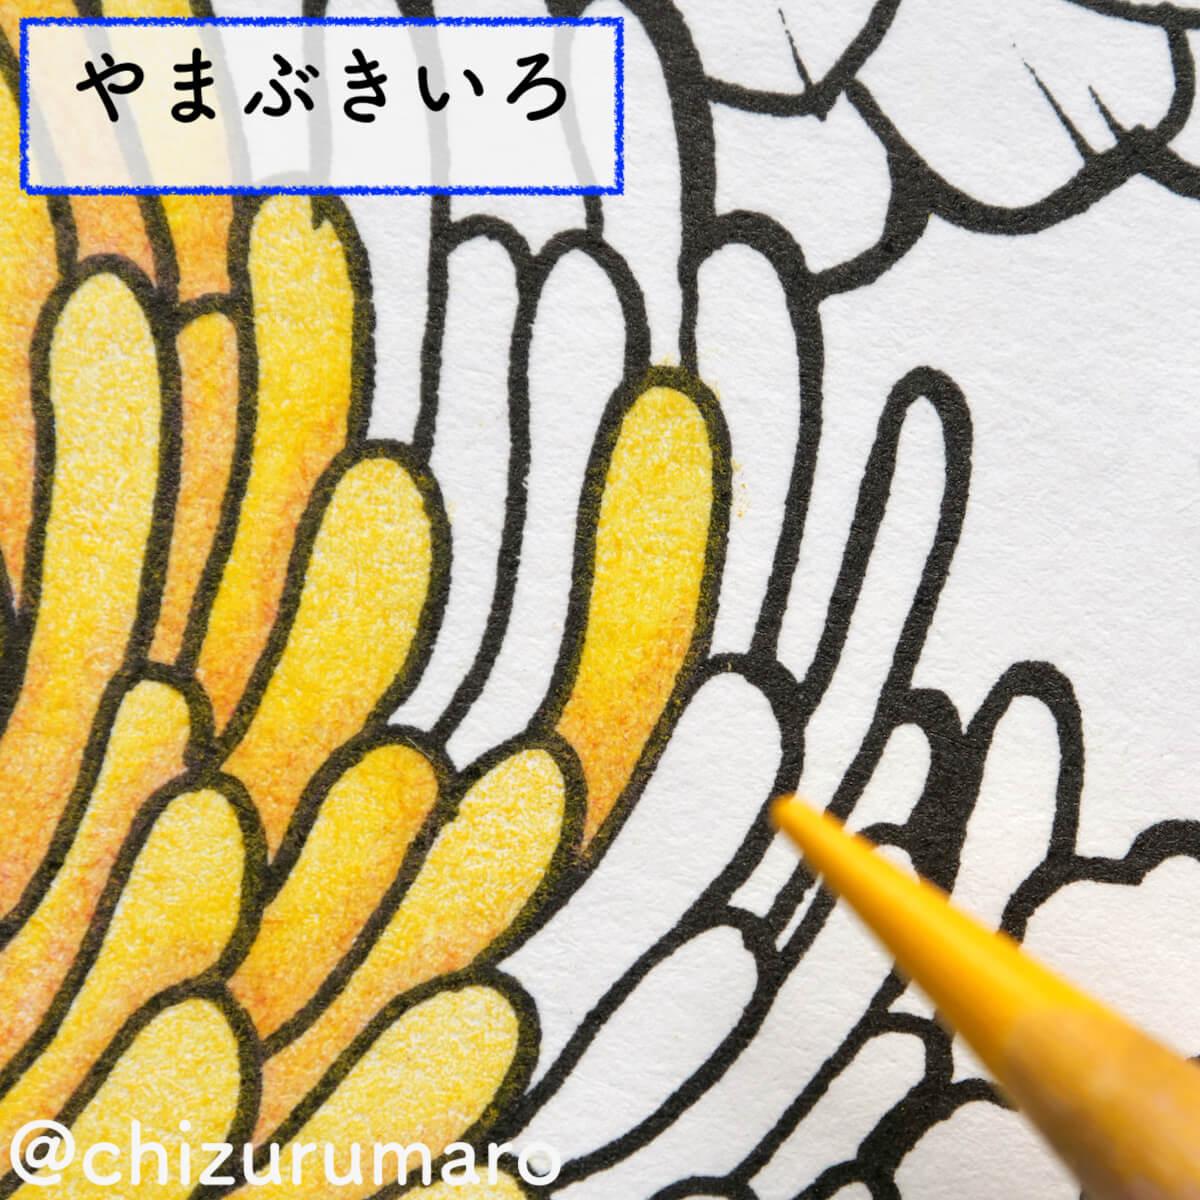 f:id:chizurumaro:20200930151720j:plain